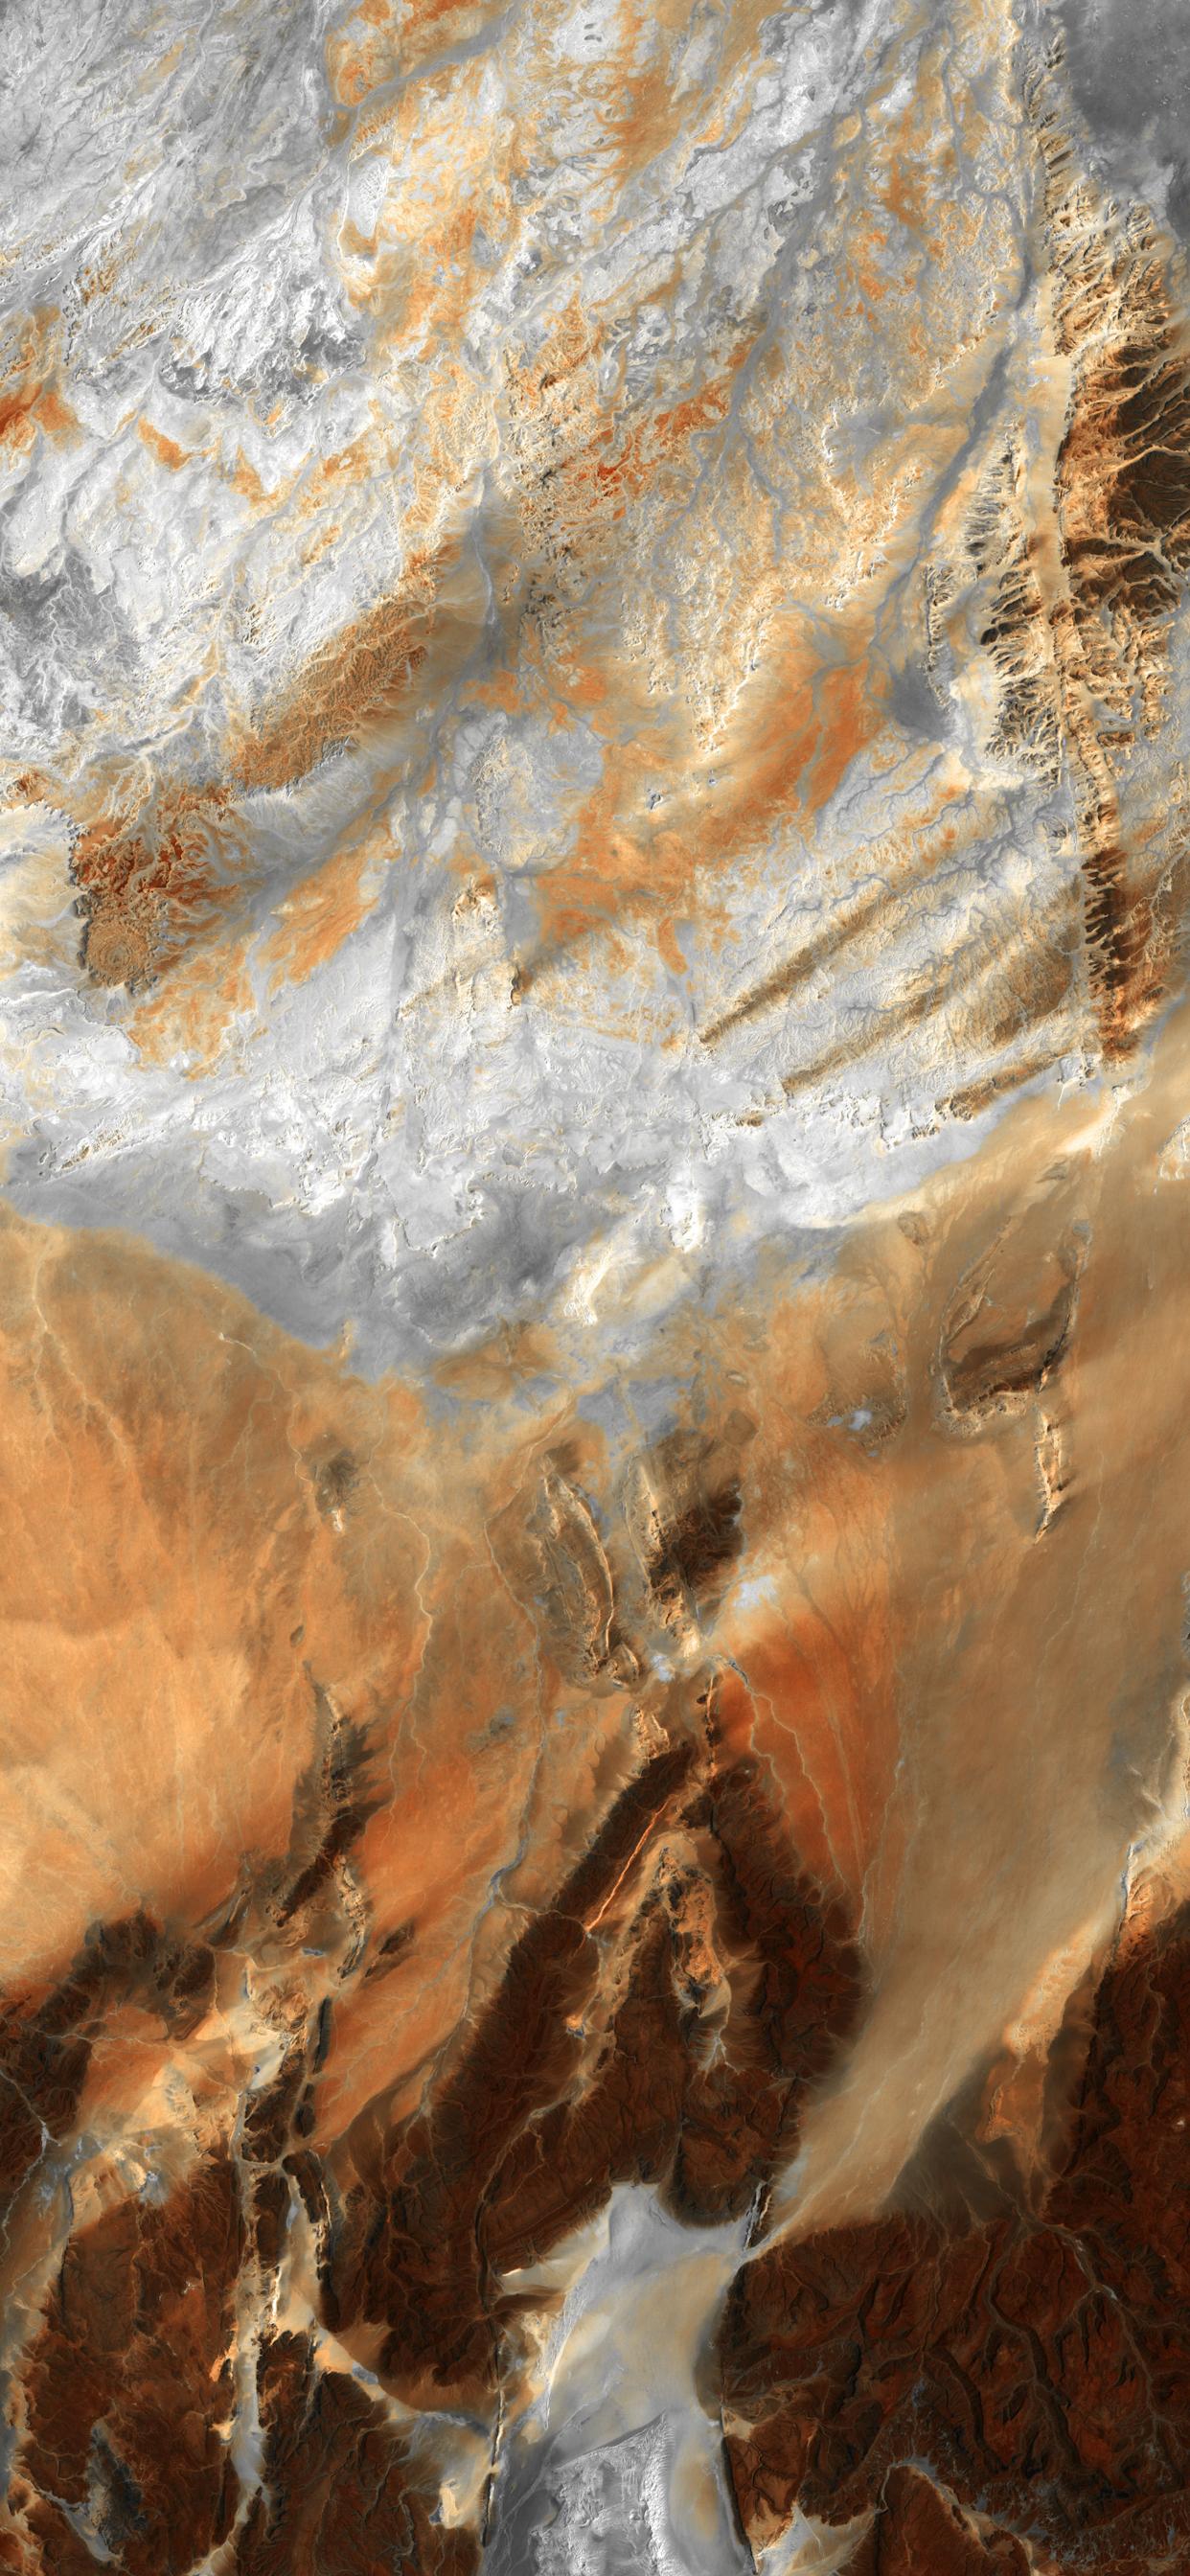 iPhone wallpapers satellite images sahara desert Fonds d'écran iPhone du 21/01/2020